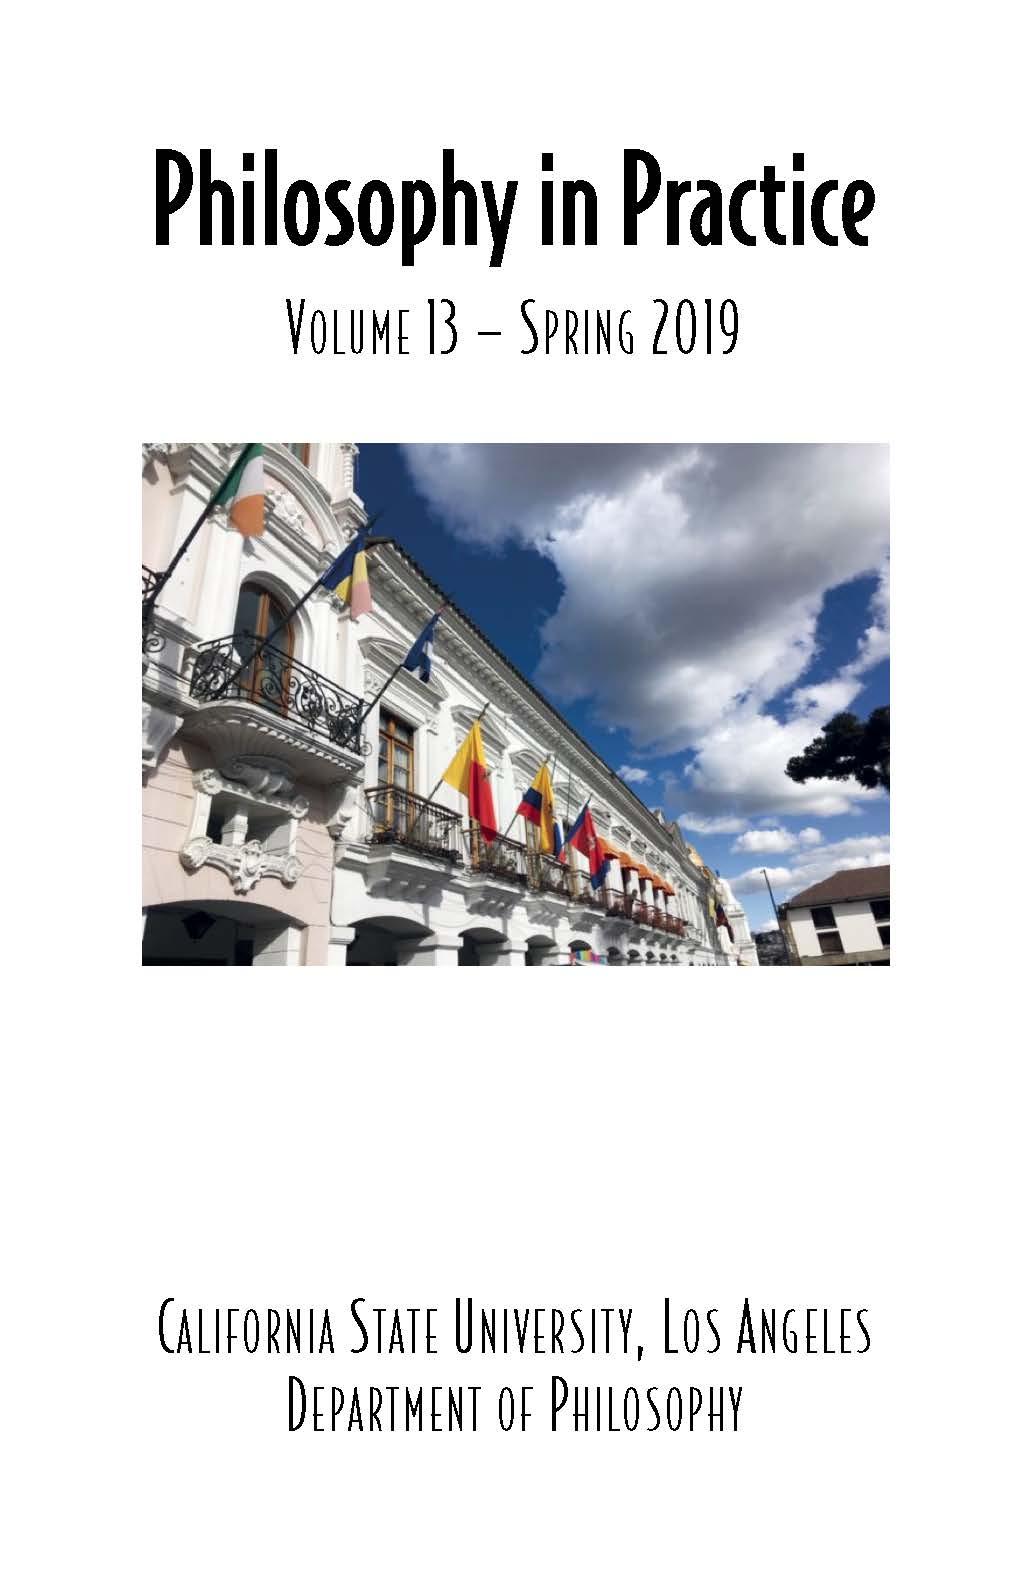 PiP volume 13 cover